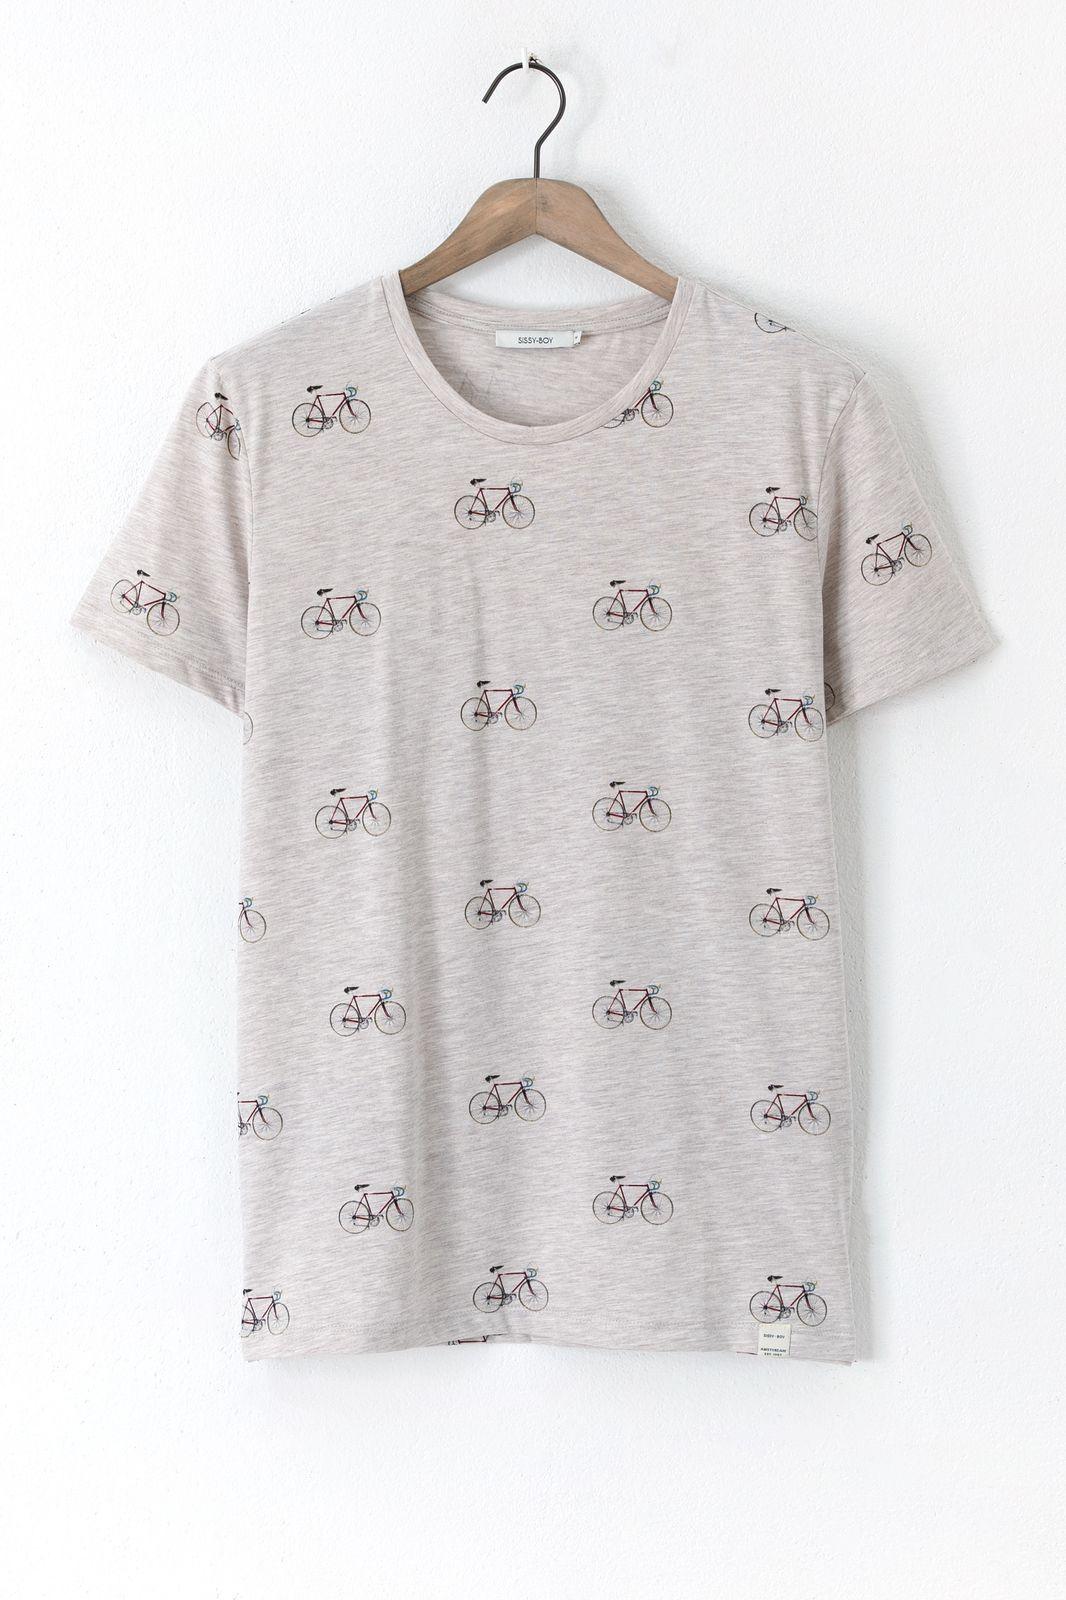 Grijs T-shirt met bicycle print - Heren | Sissy-Boy